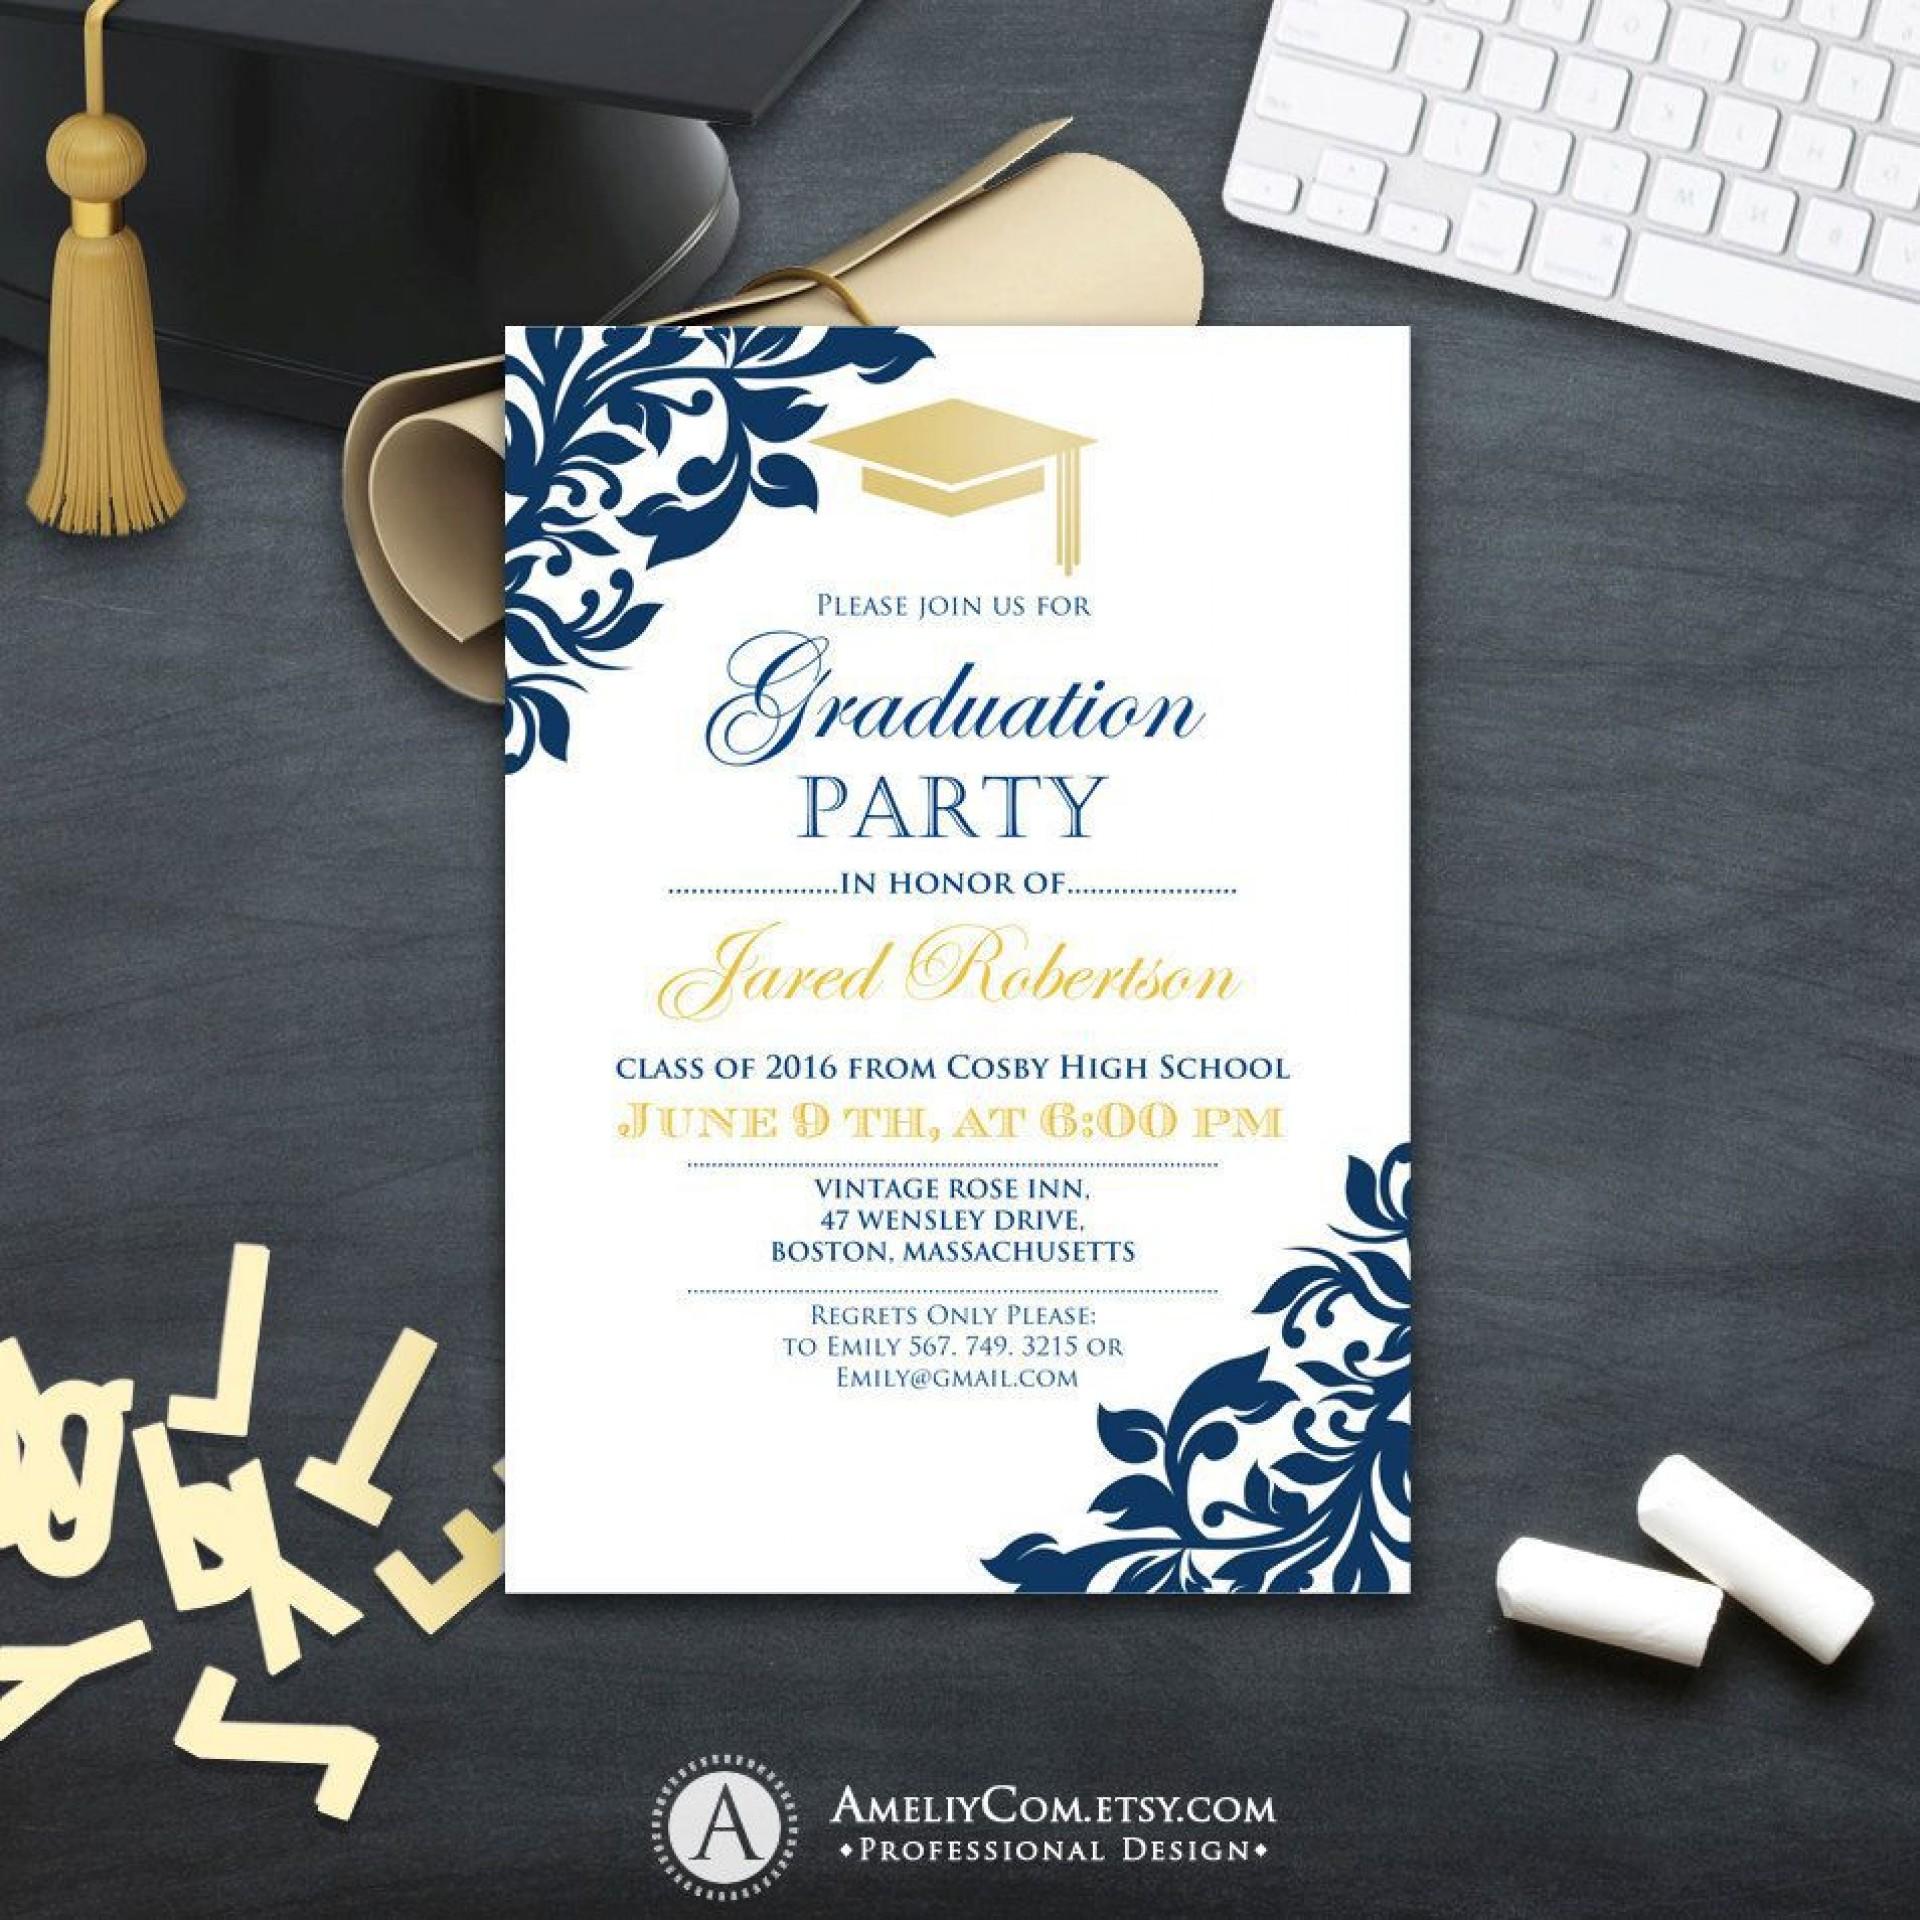 003 Wonderful College Graduation Party Invitation Template Design  Templates1920